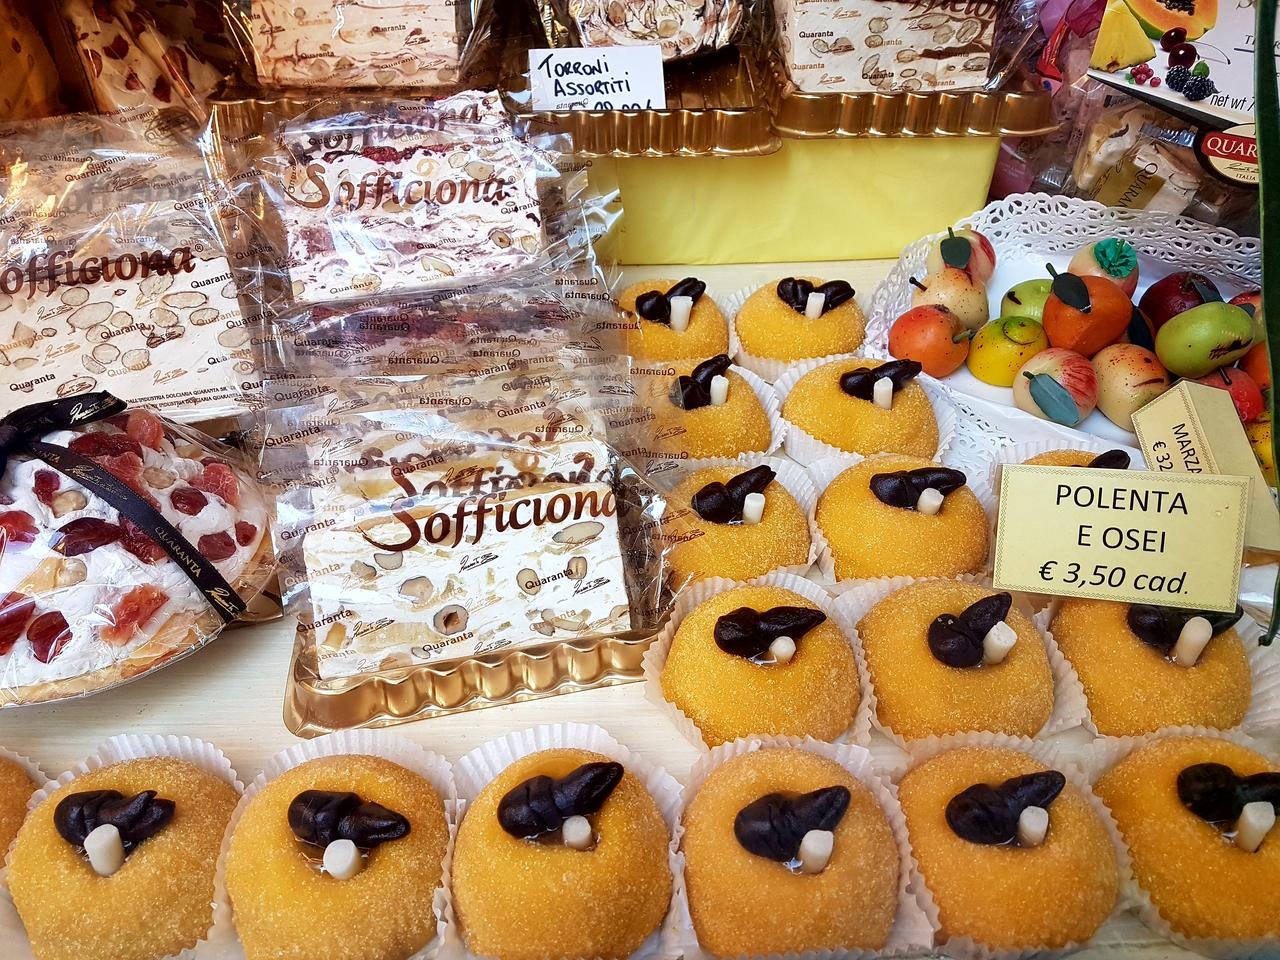 Bergamo polenta e osei